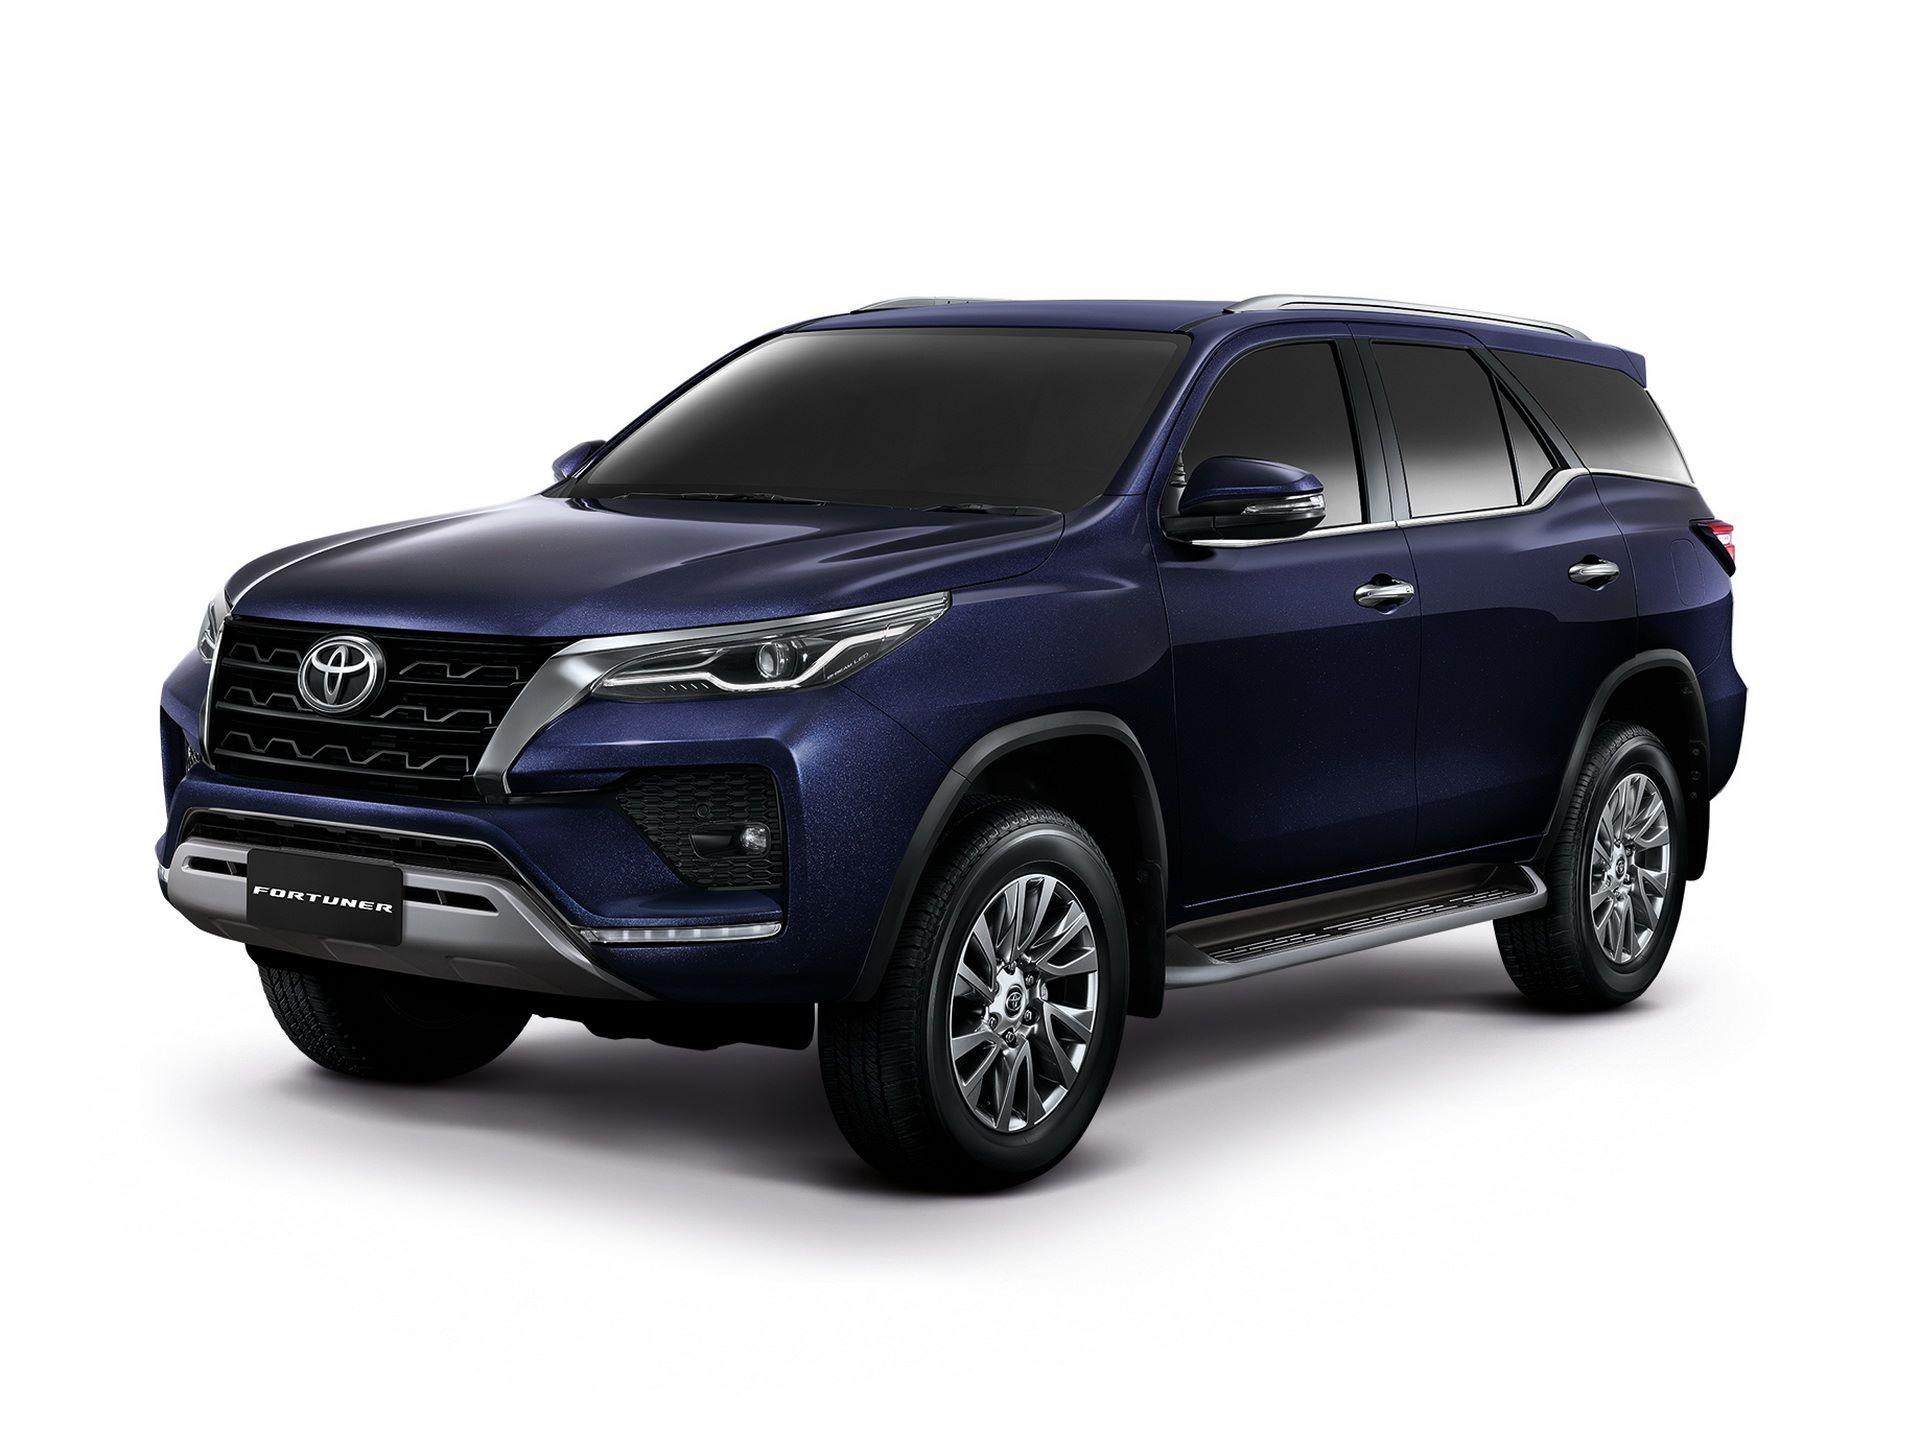 Toyota-Fortuner-2020-7